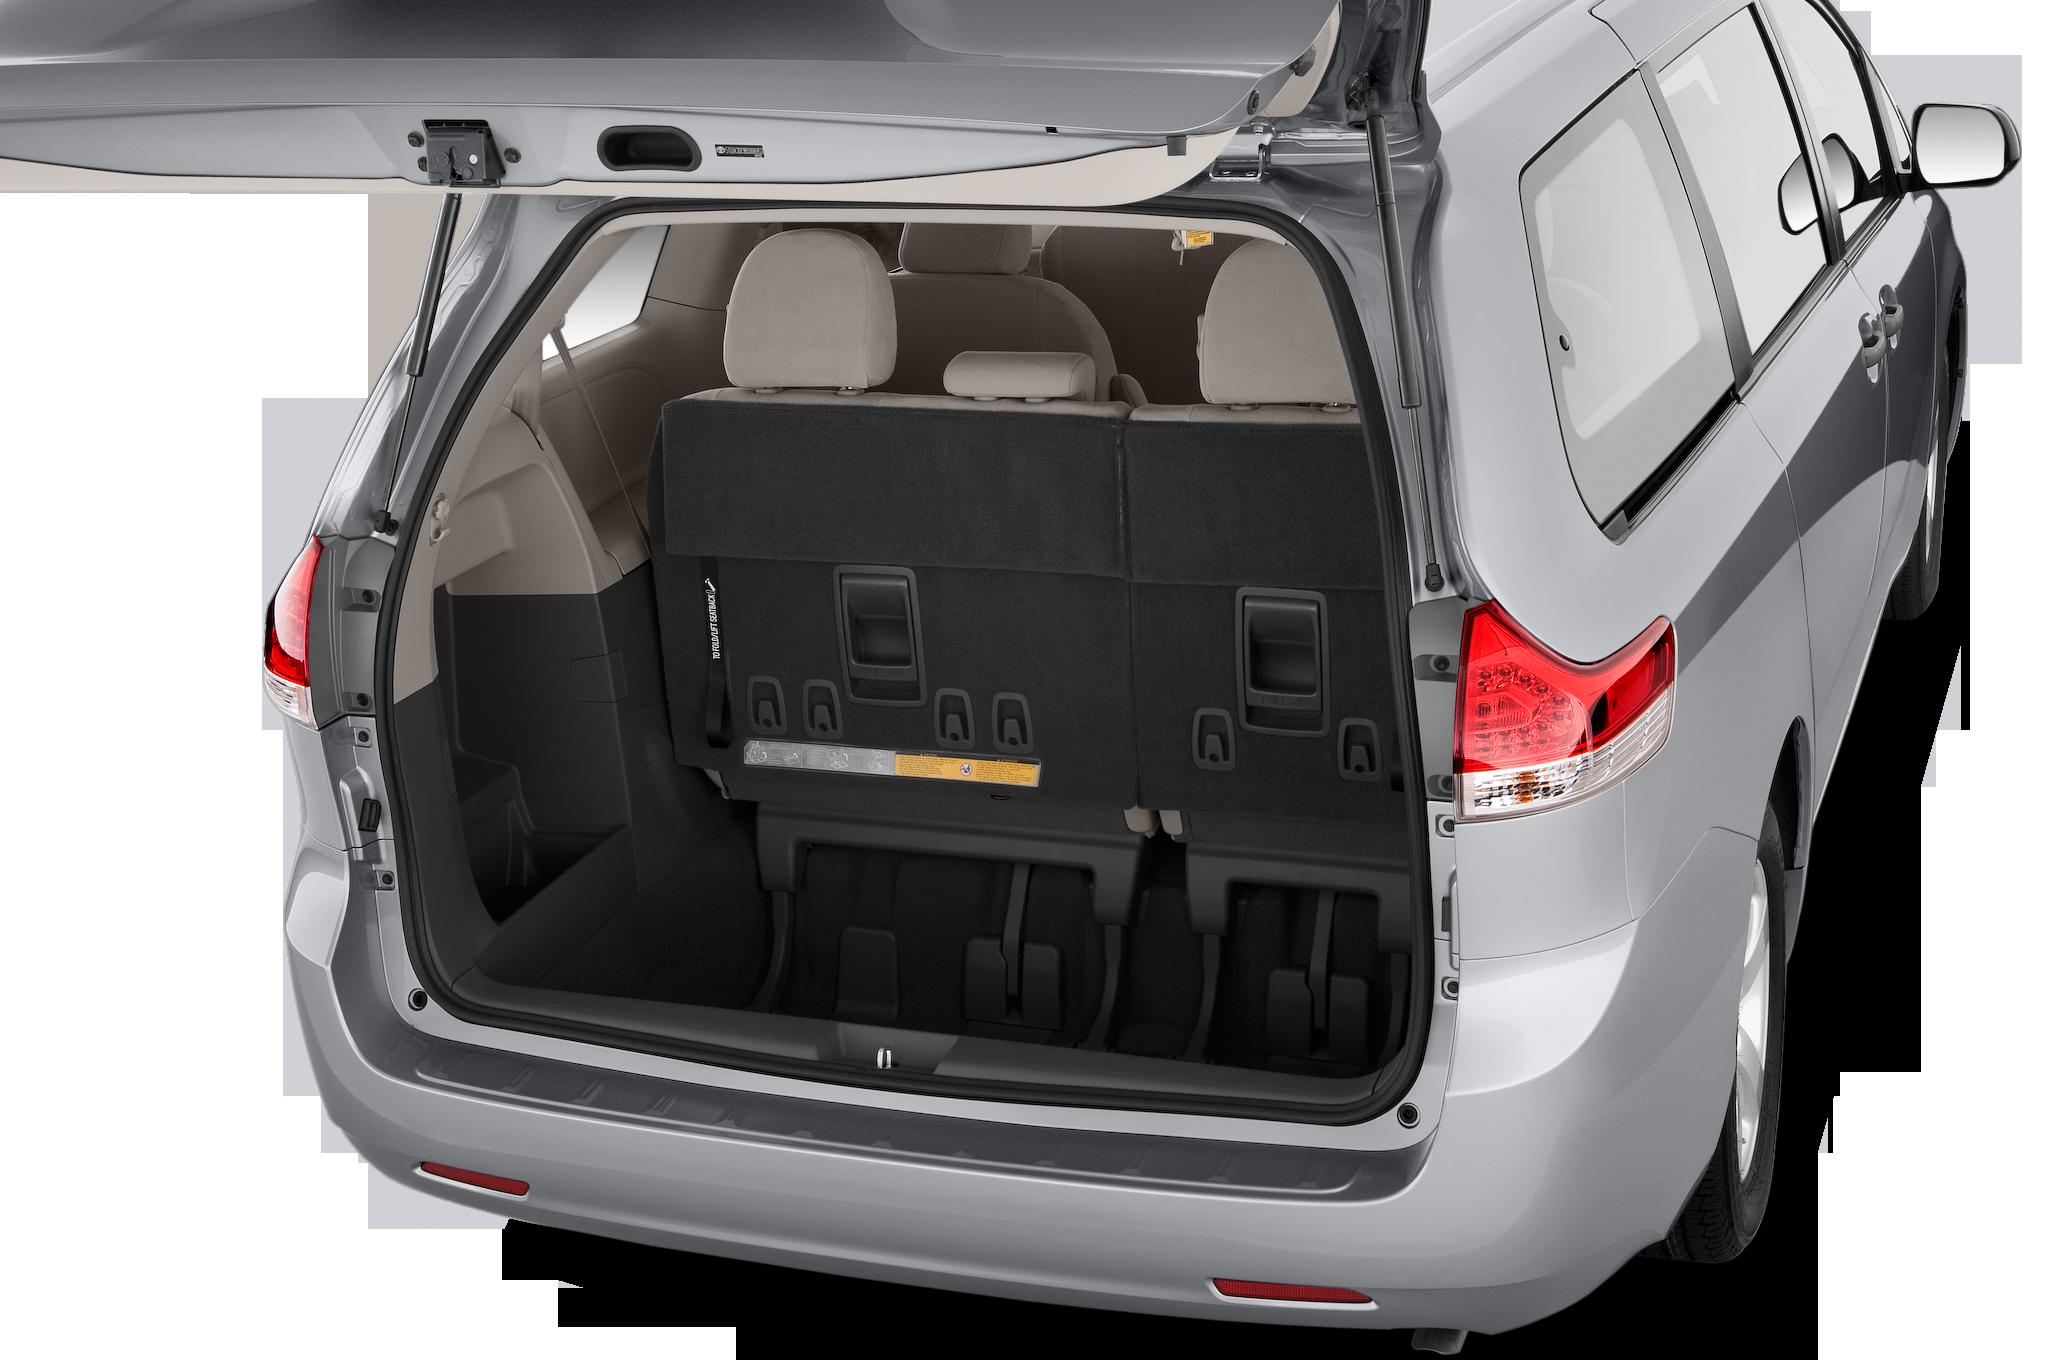 Mazda Cx 5 Cargo >> 2012 Toyota Sienna XLE - Editors' Notebook - Automobile Magazine